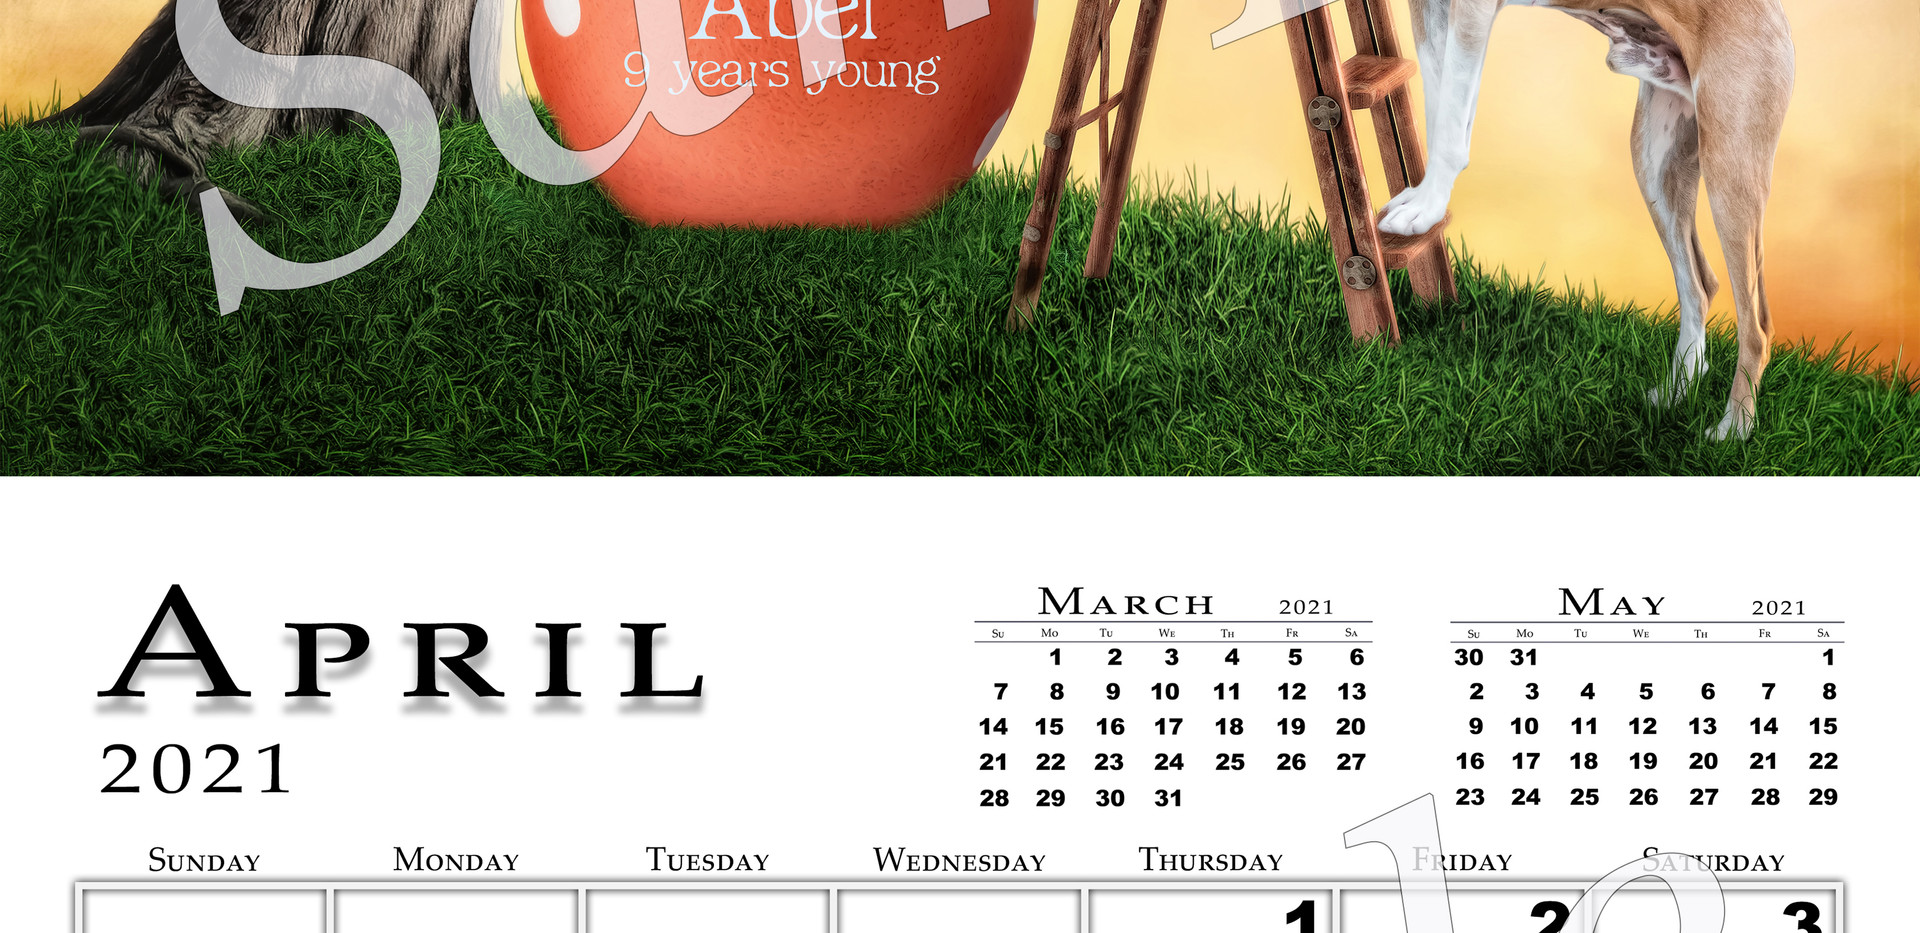 April 2021 Full Page Sample.jpg